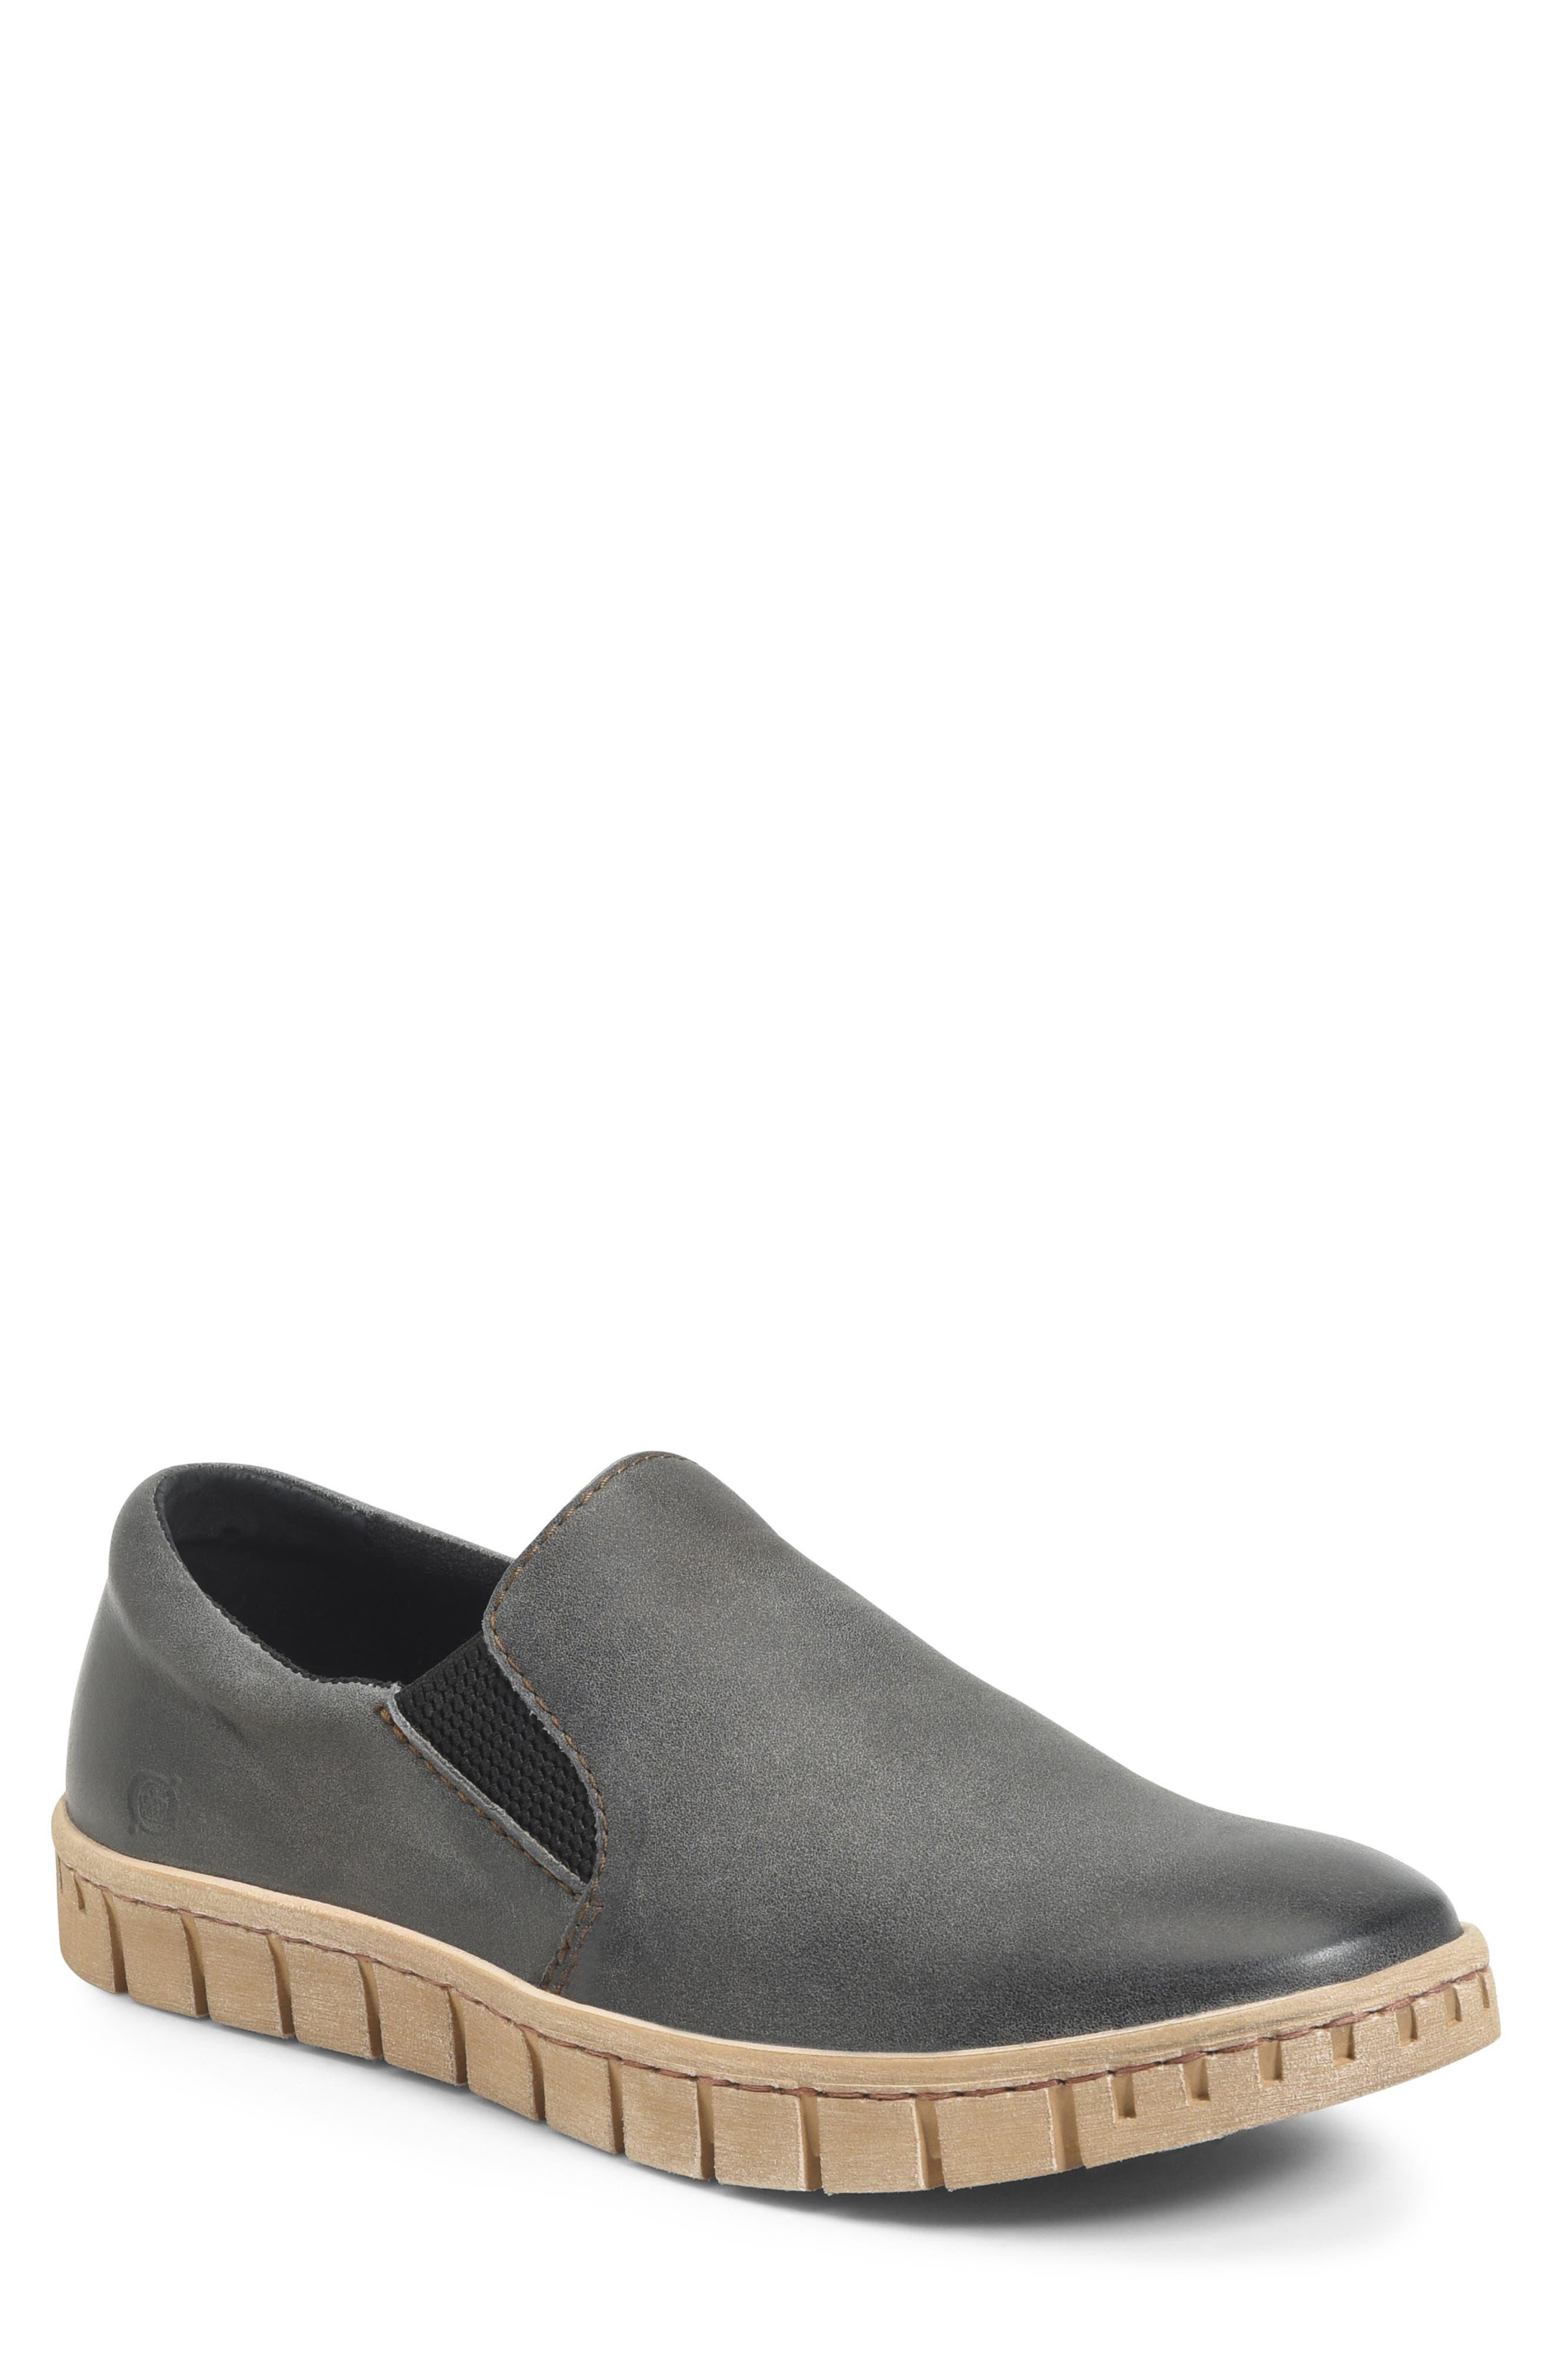 Image of Born Semmler Plain Toe Slip-On Shoe